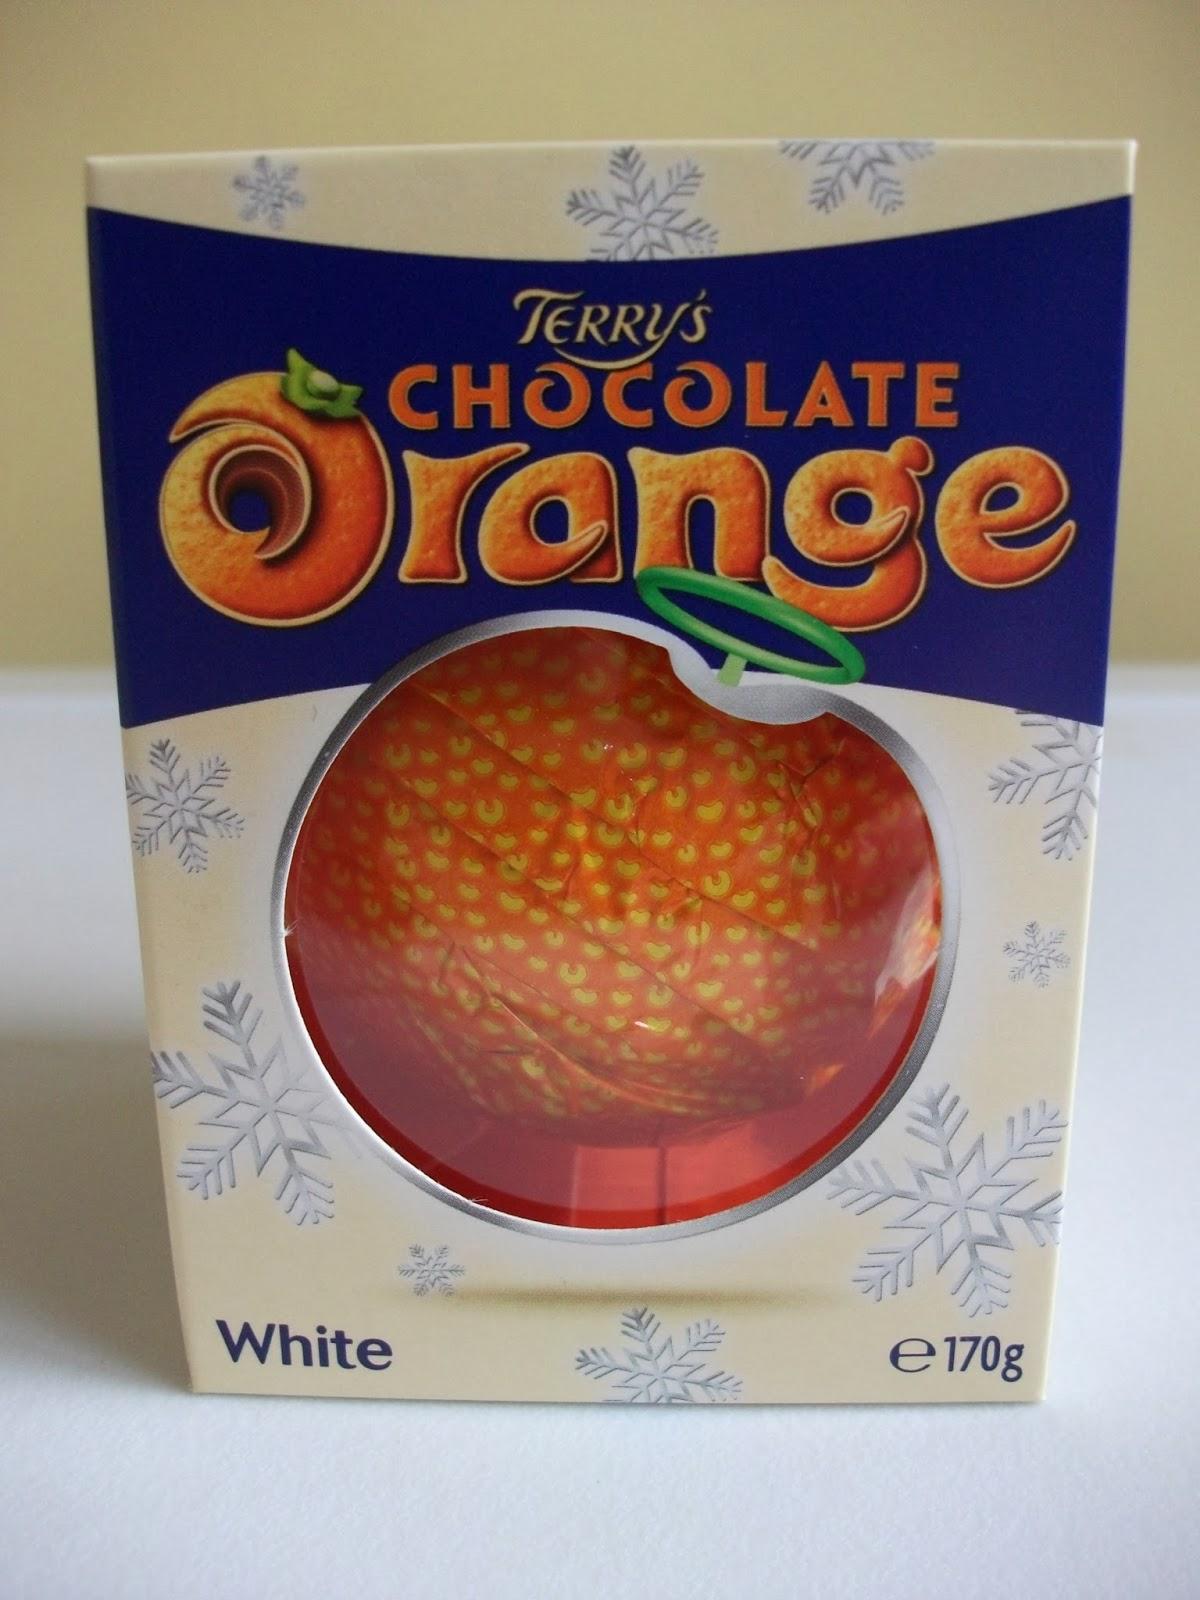 Terrys White Chocolate Orange Review